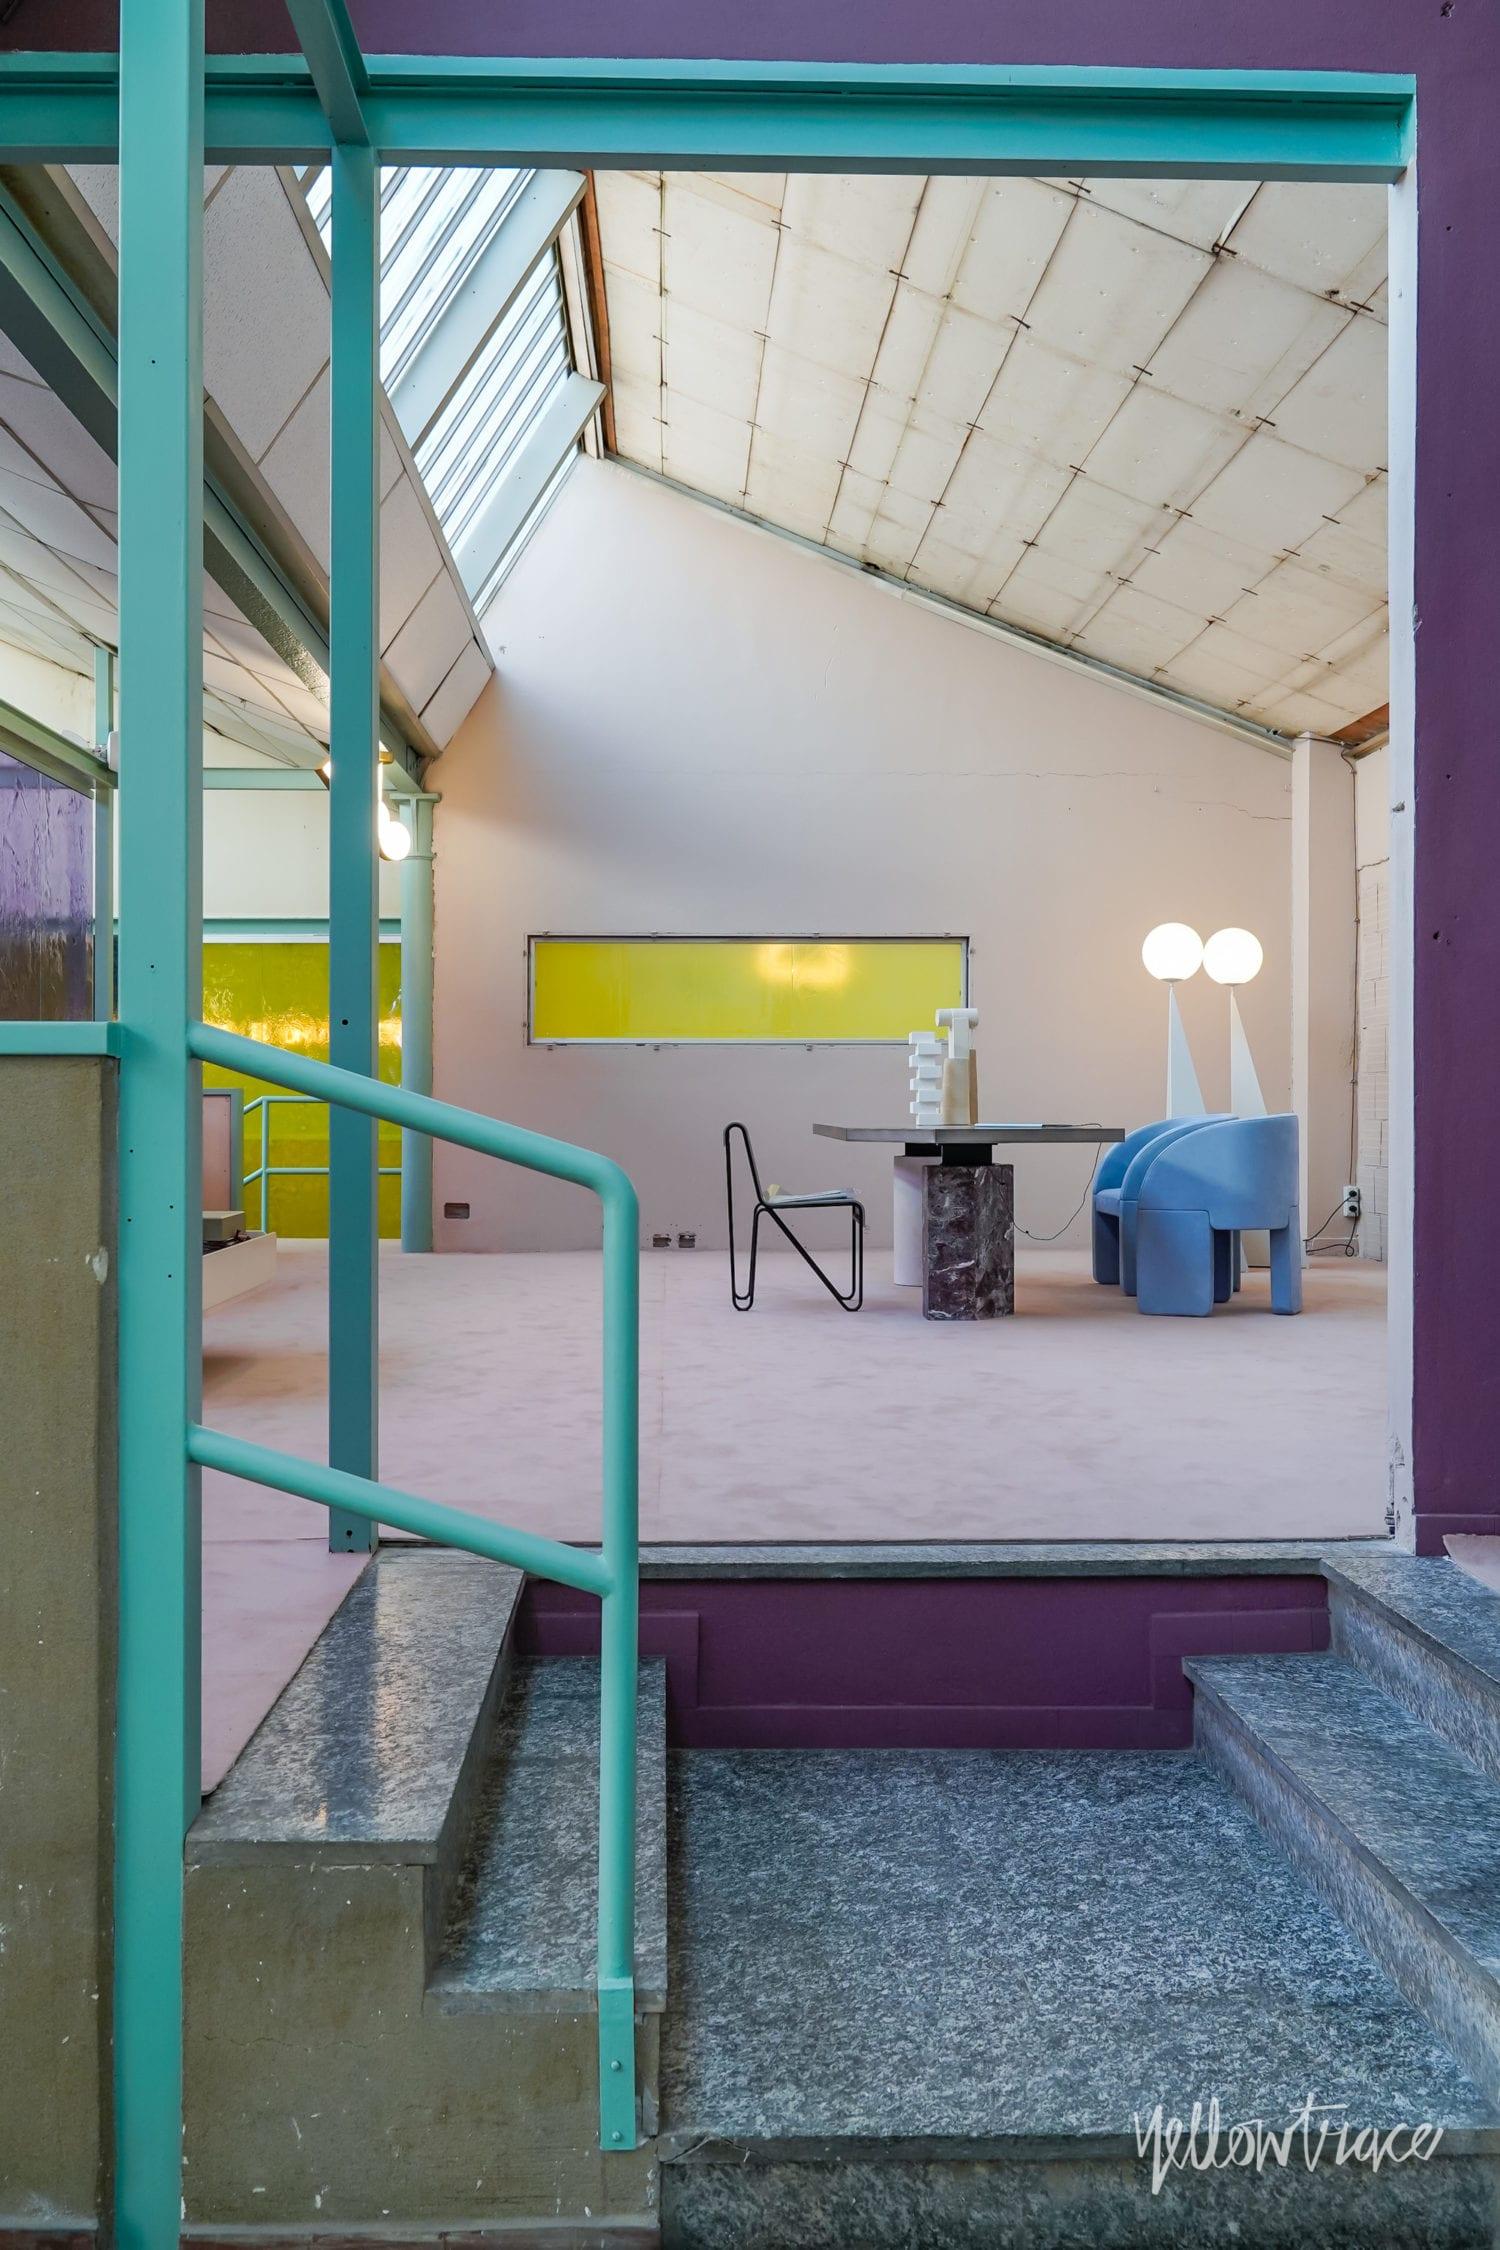 Les Arcanistes Studiopepe At Milan Design Week 2019 Photo Nick Hughes Yellowtrace 04